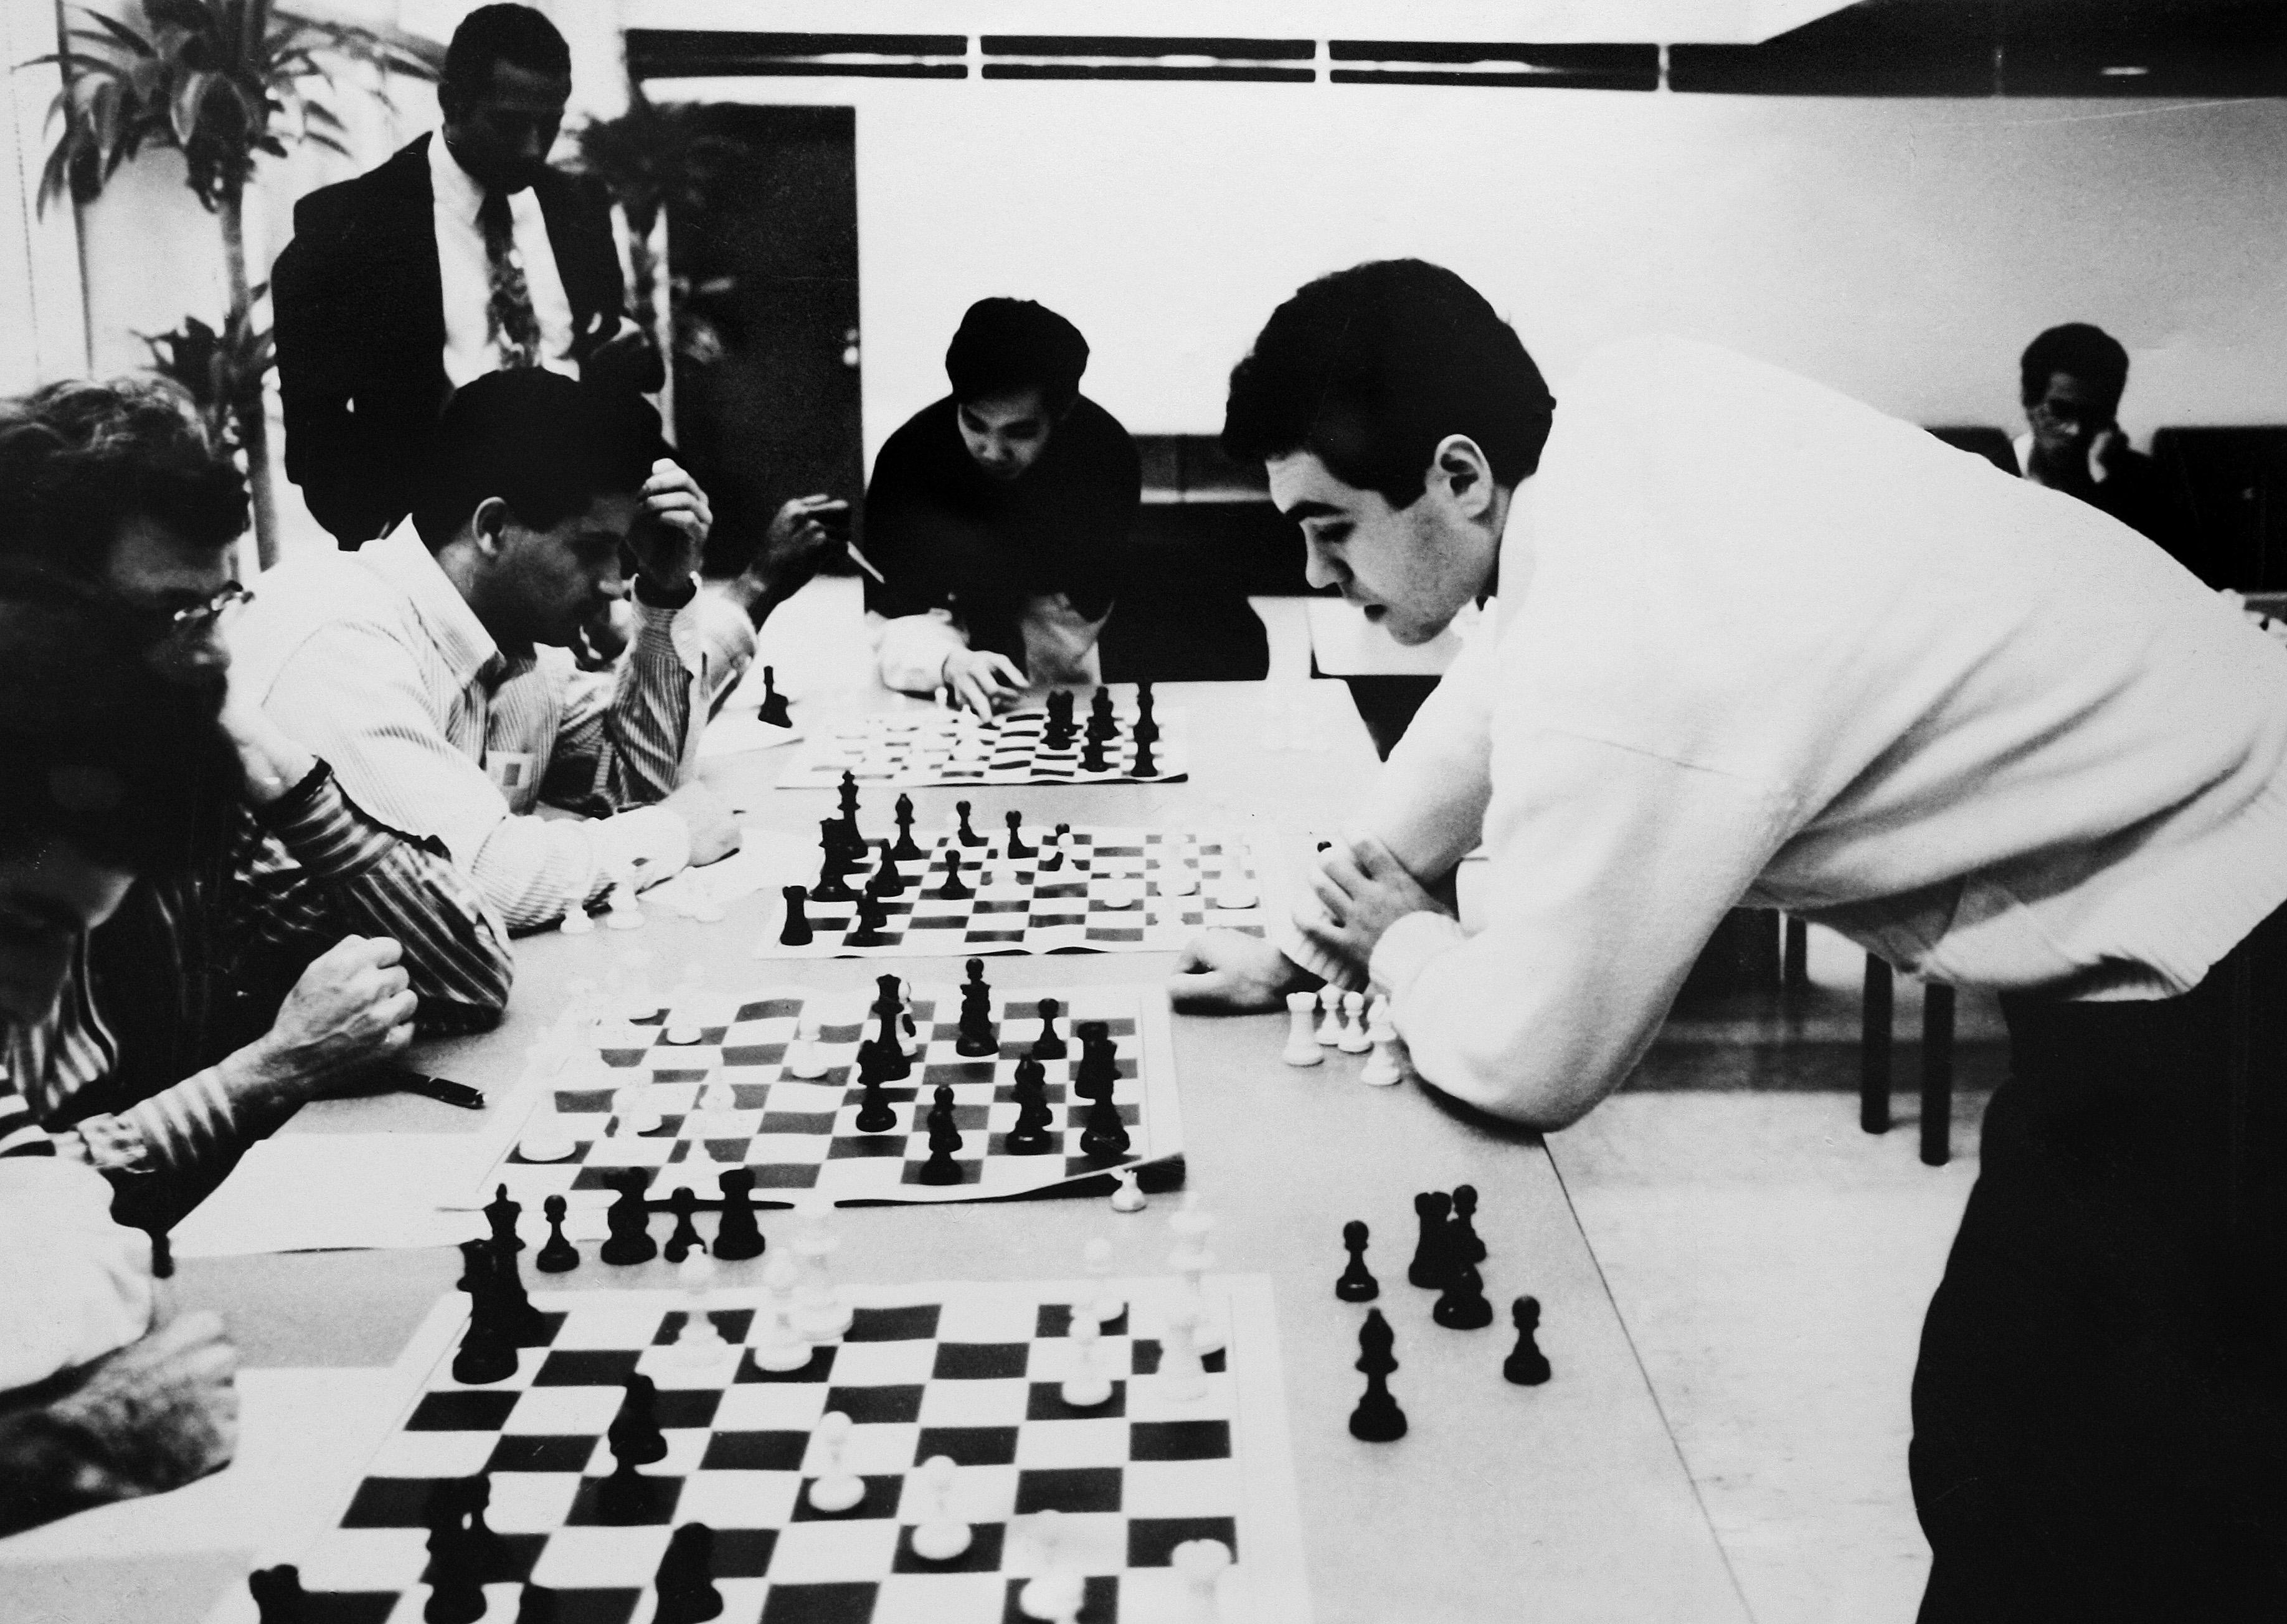 BMCC Chess